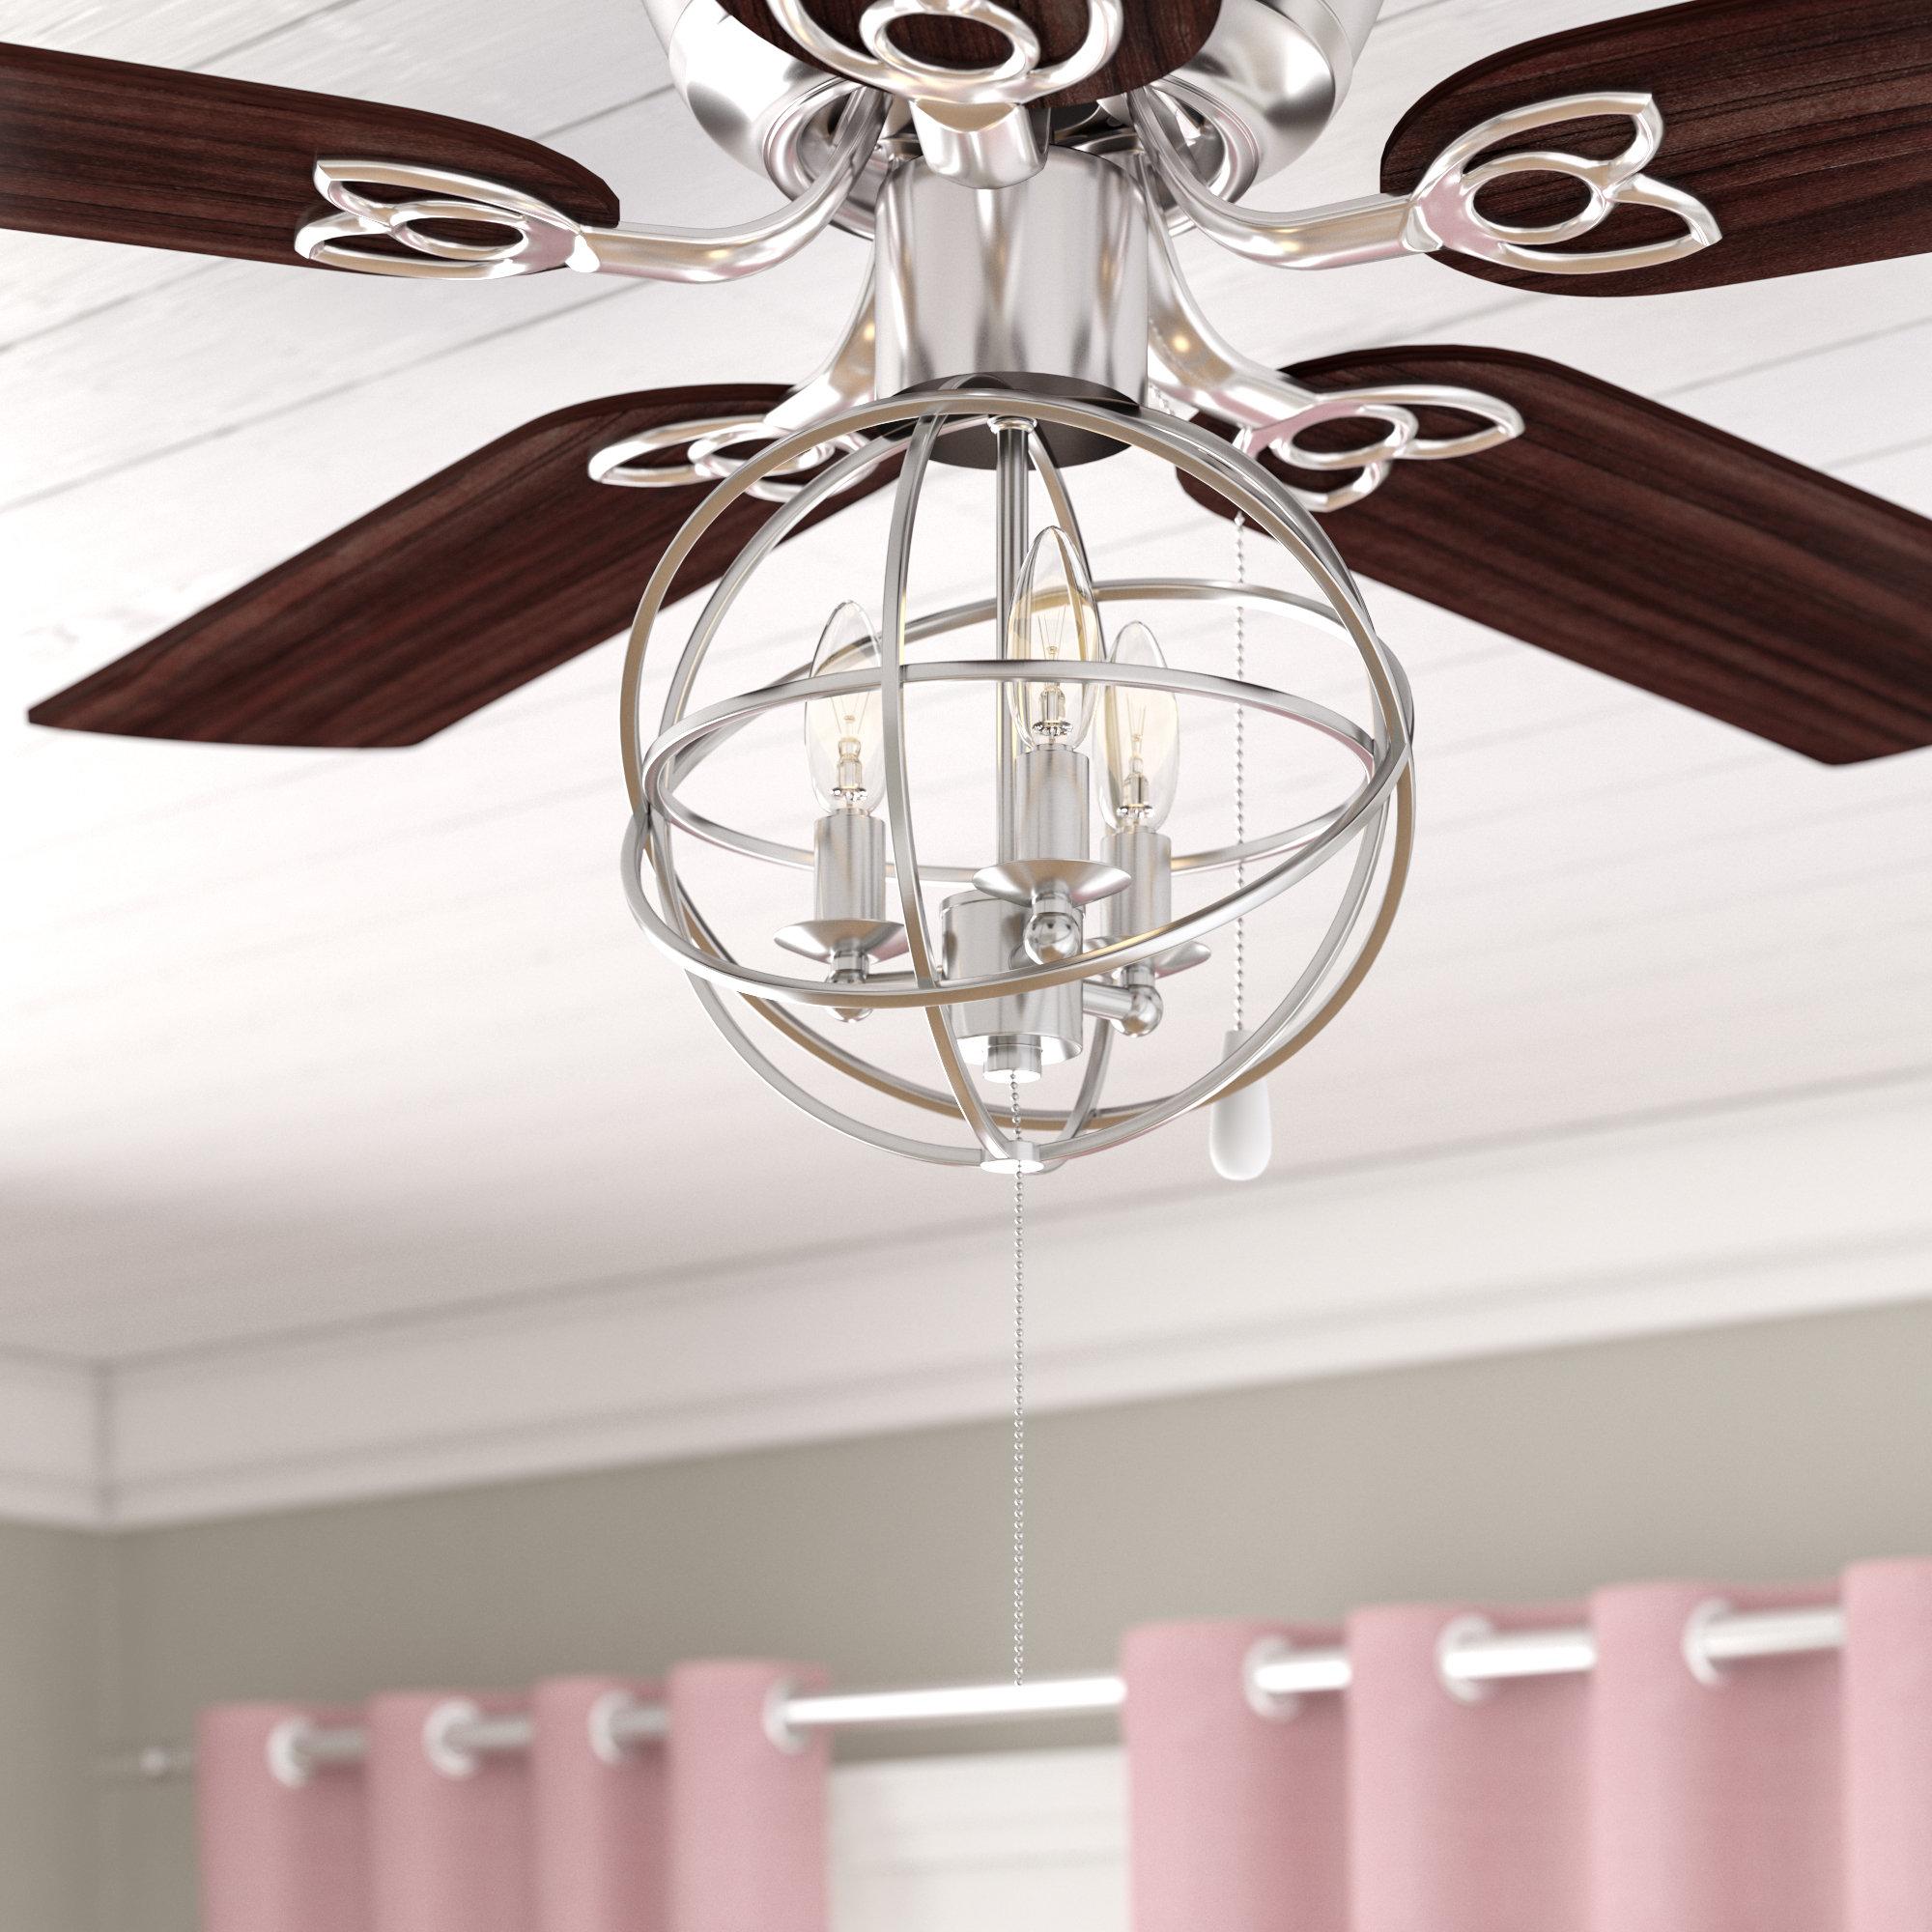 Gracie oaks 3 light led globe ceiling fan light kit reviews wayfair